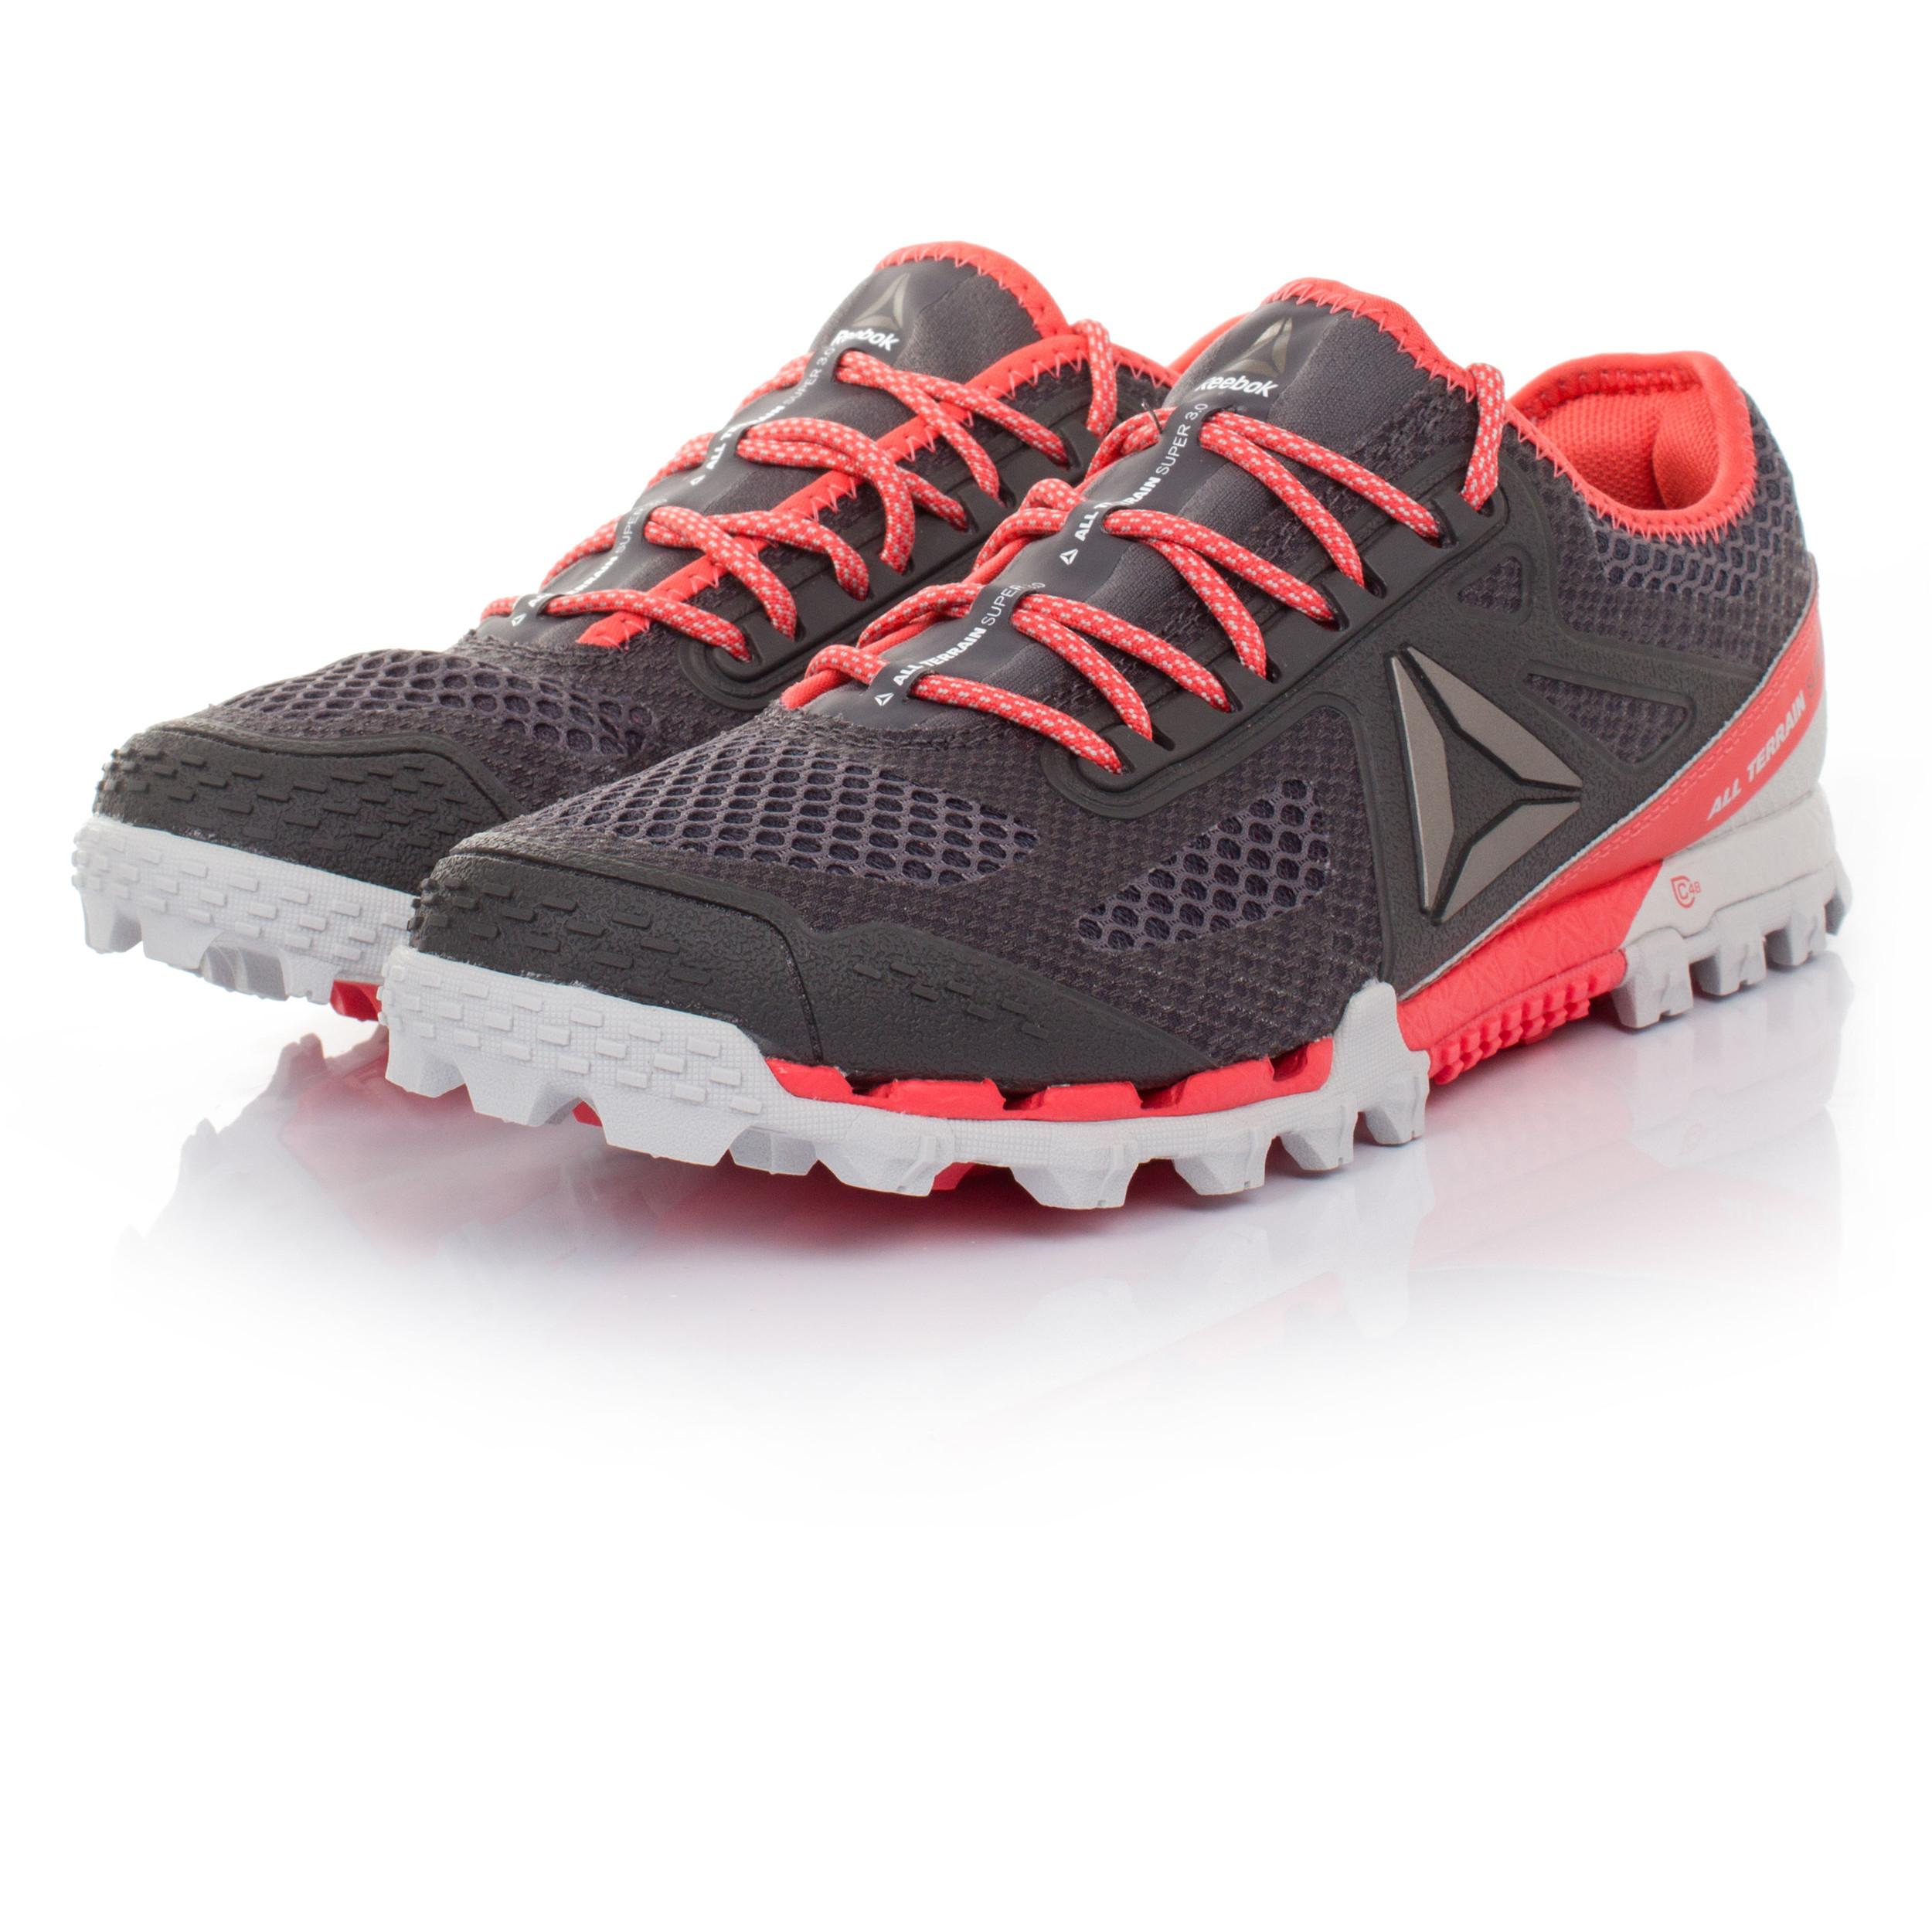 New Reebok All Terrain Shoes